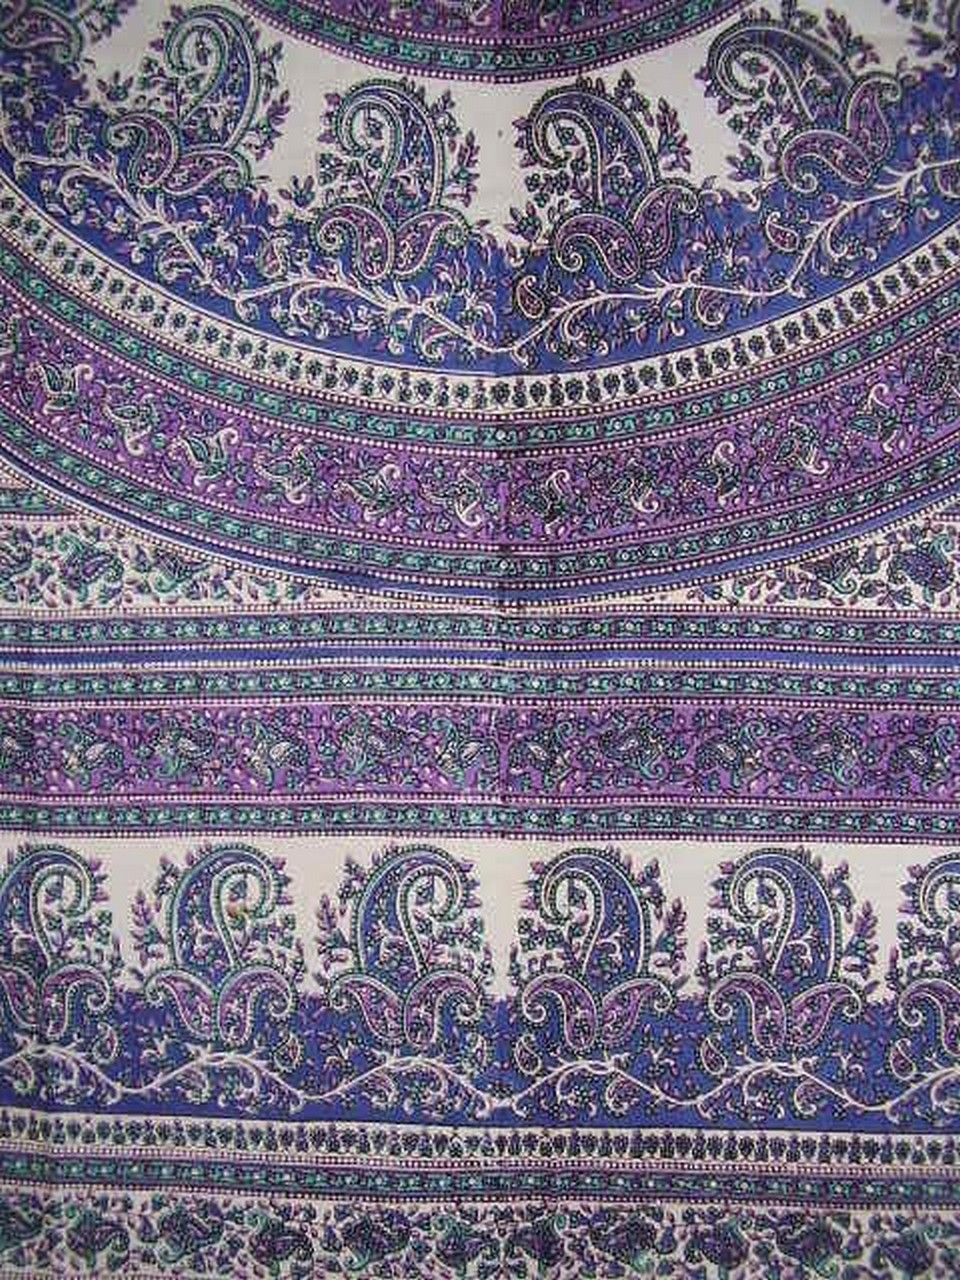 India Arts Paisley Mandala Tapestry Cotton Bedspread 90